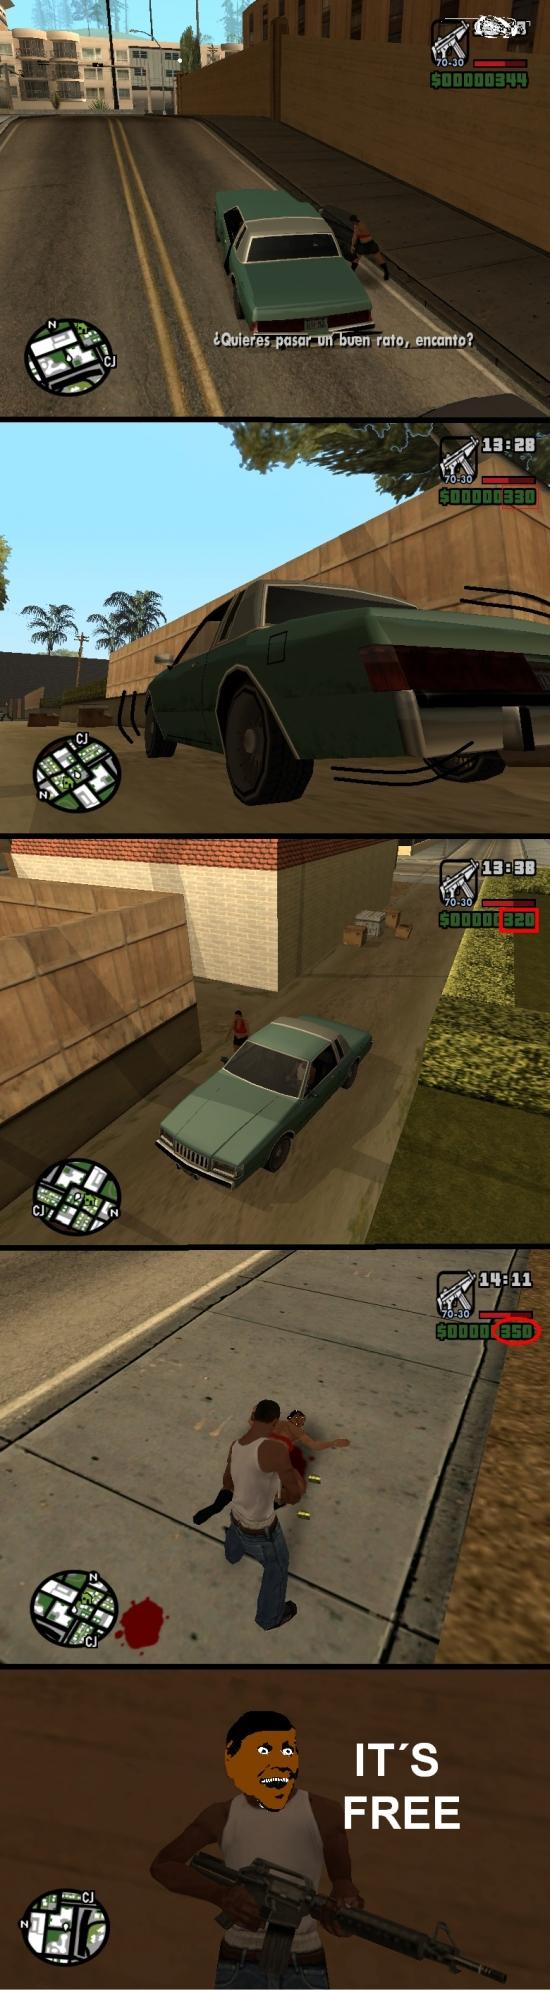 CJ,Grand Theft Auto,GTA,It's free,Prostituta,San Andreas